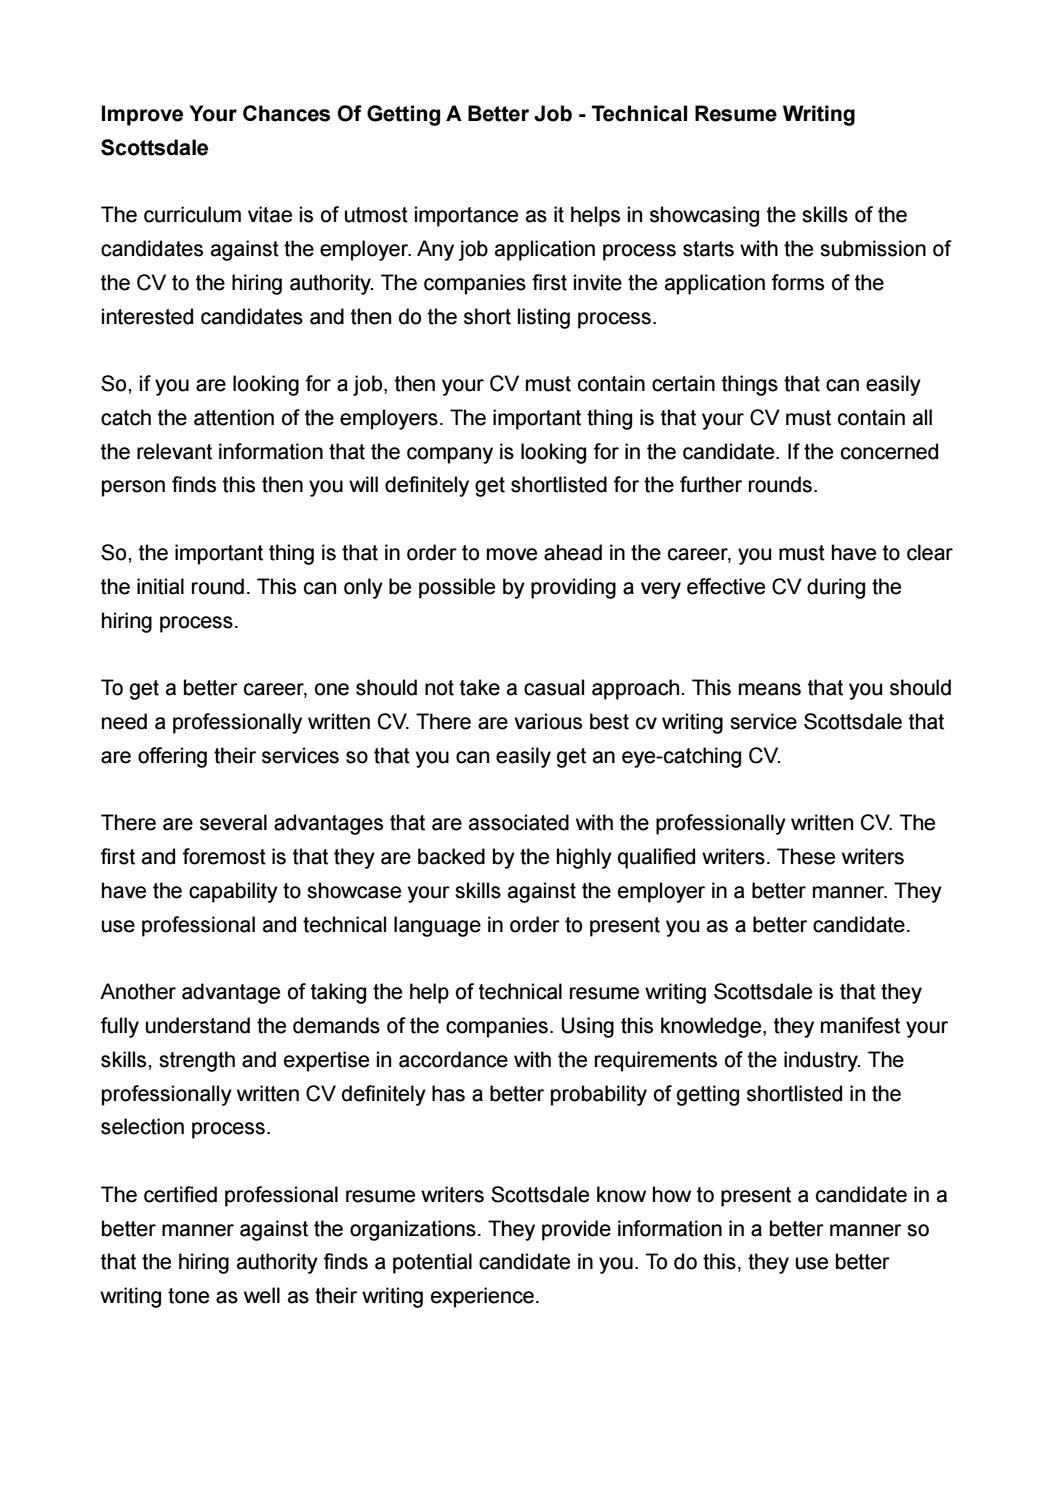 Professional Resume Writers Scottsdale By Toplineresume89 Issuu